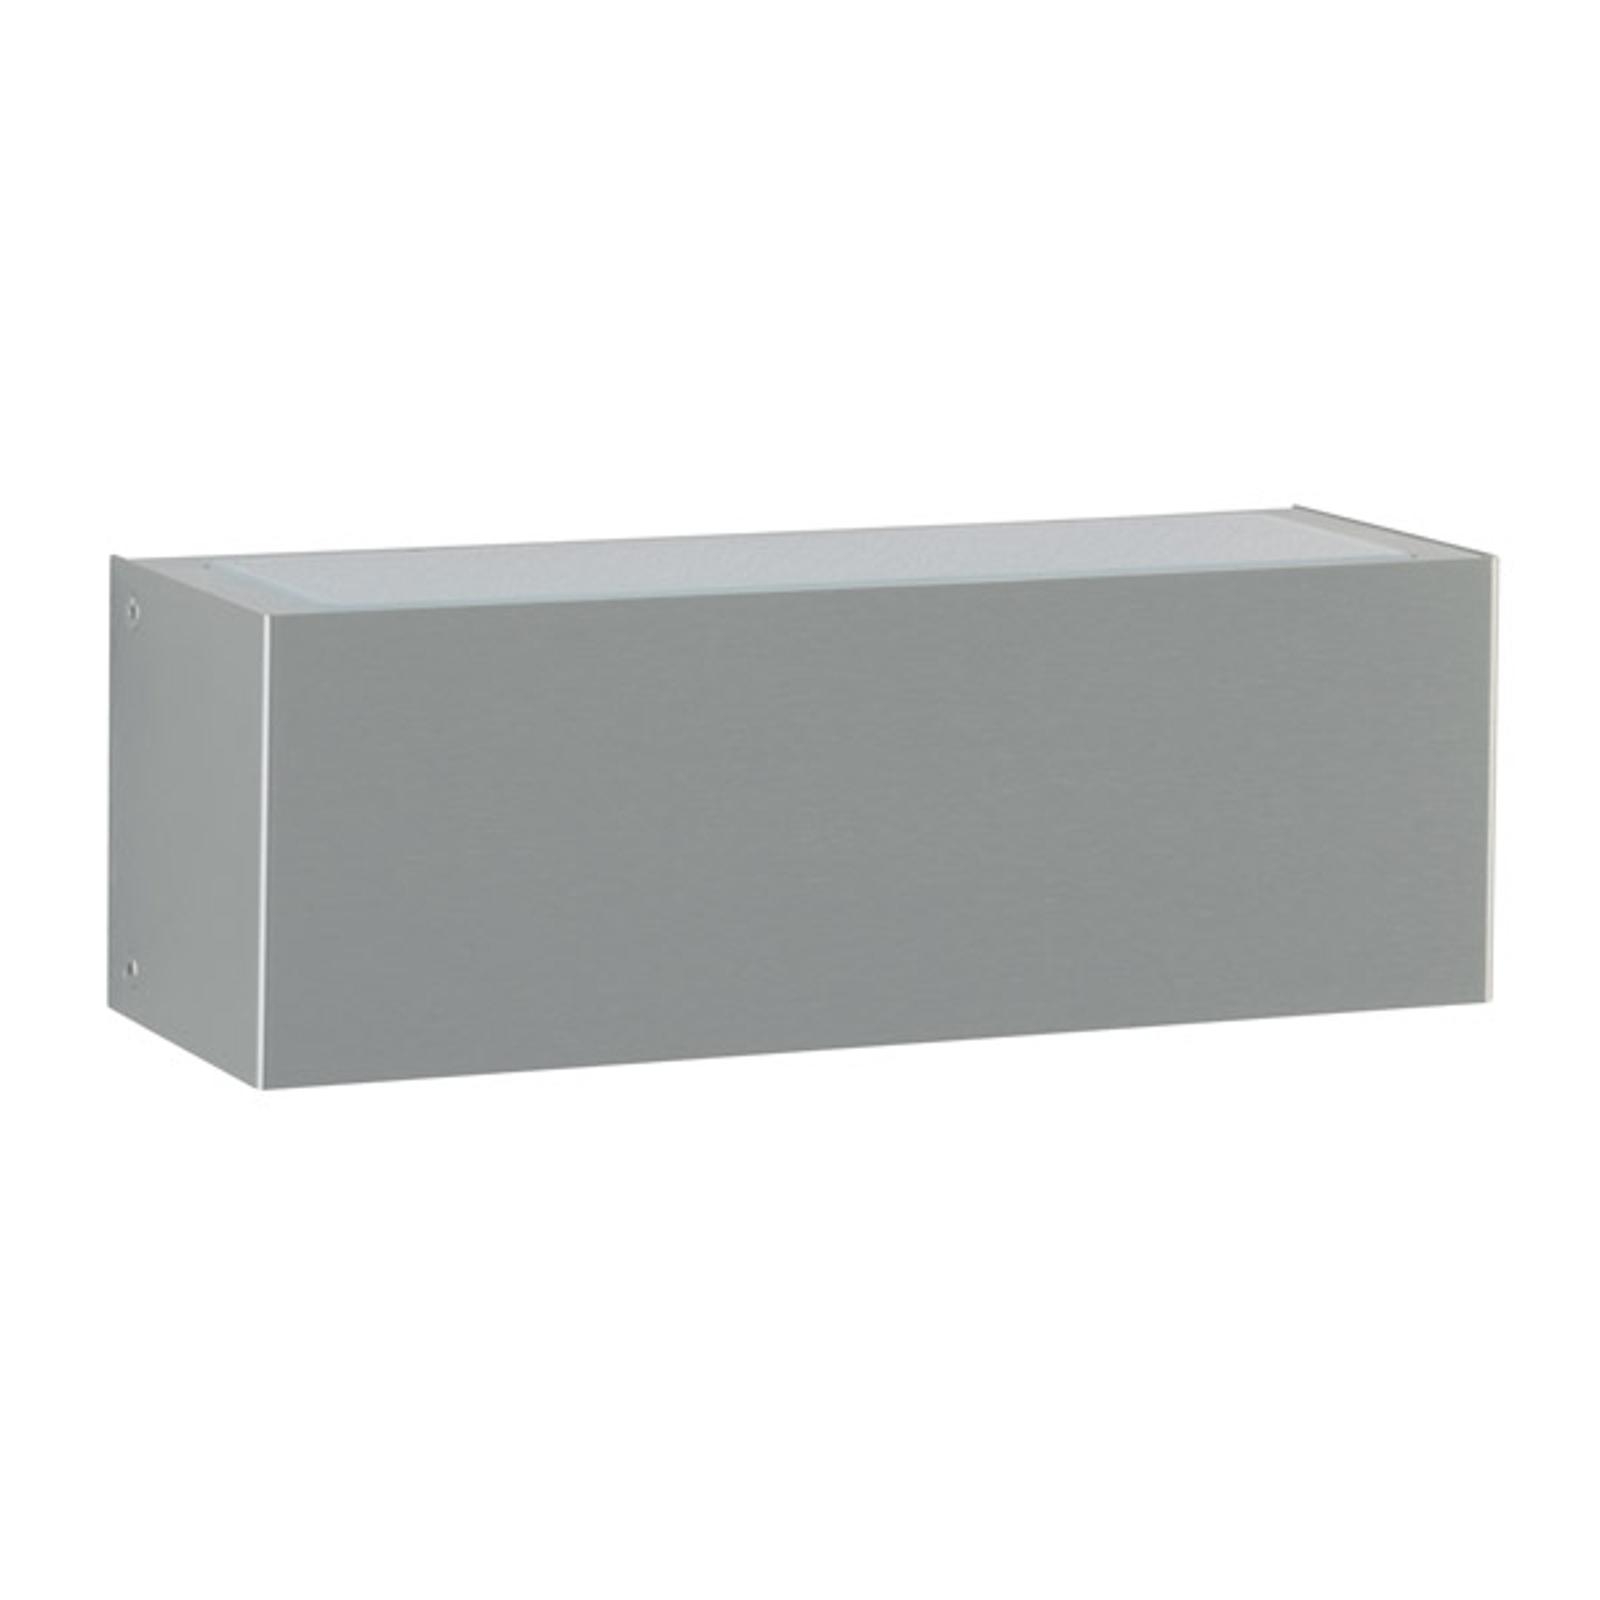 Wandlamp Cube breedte 30 cm